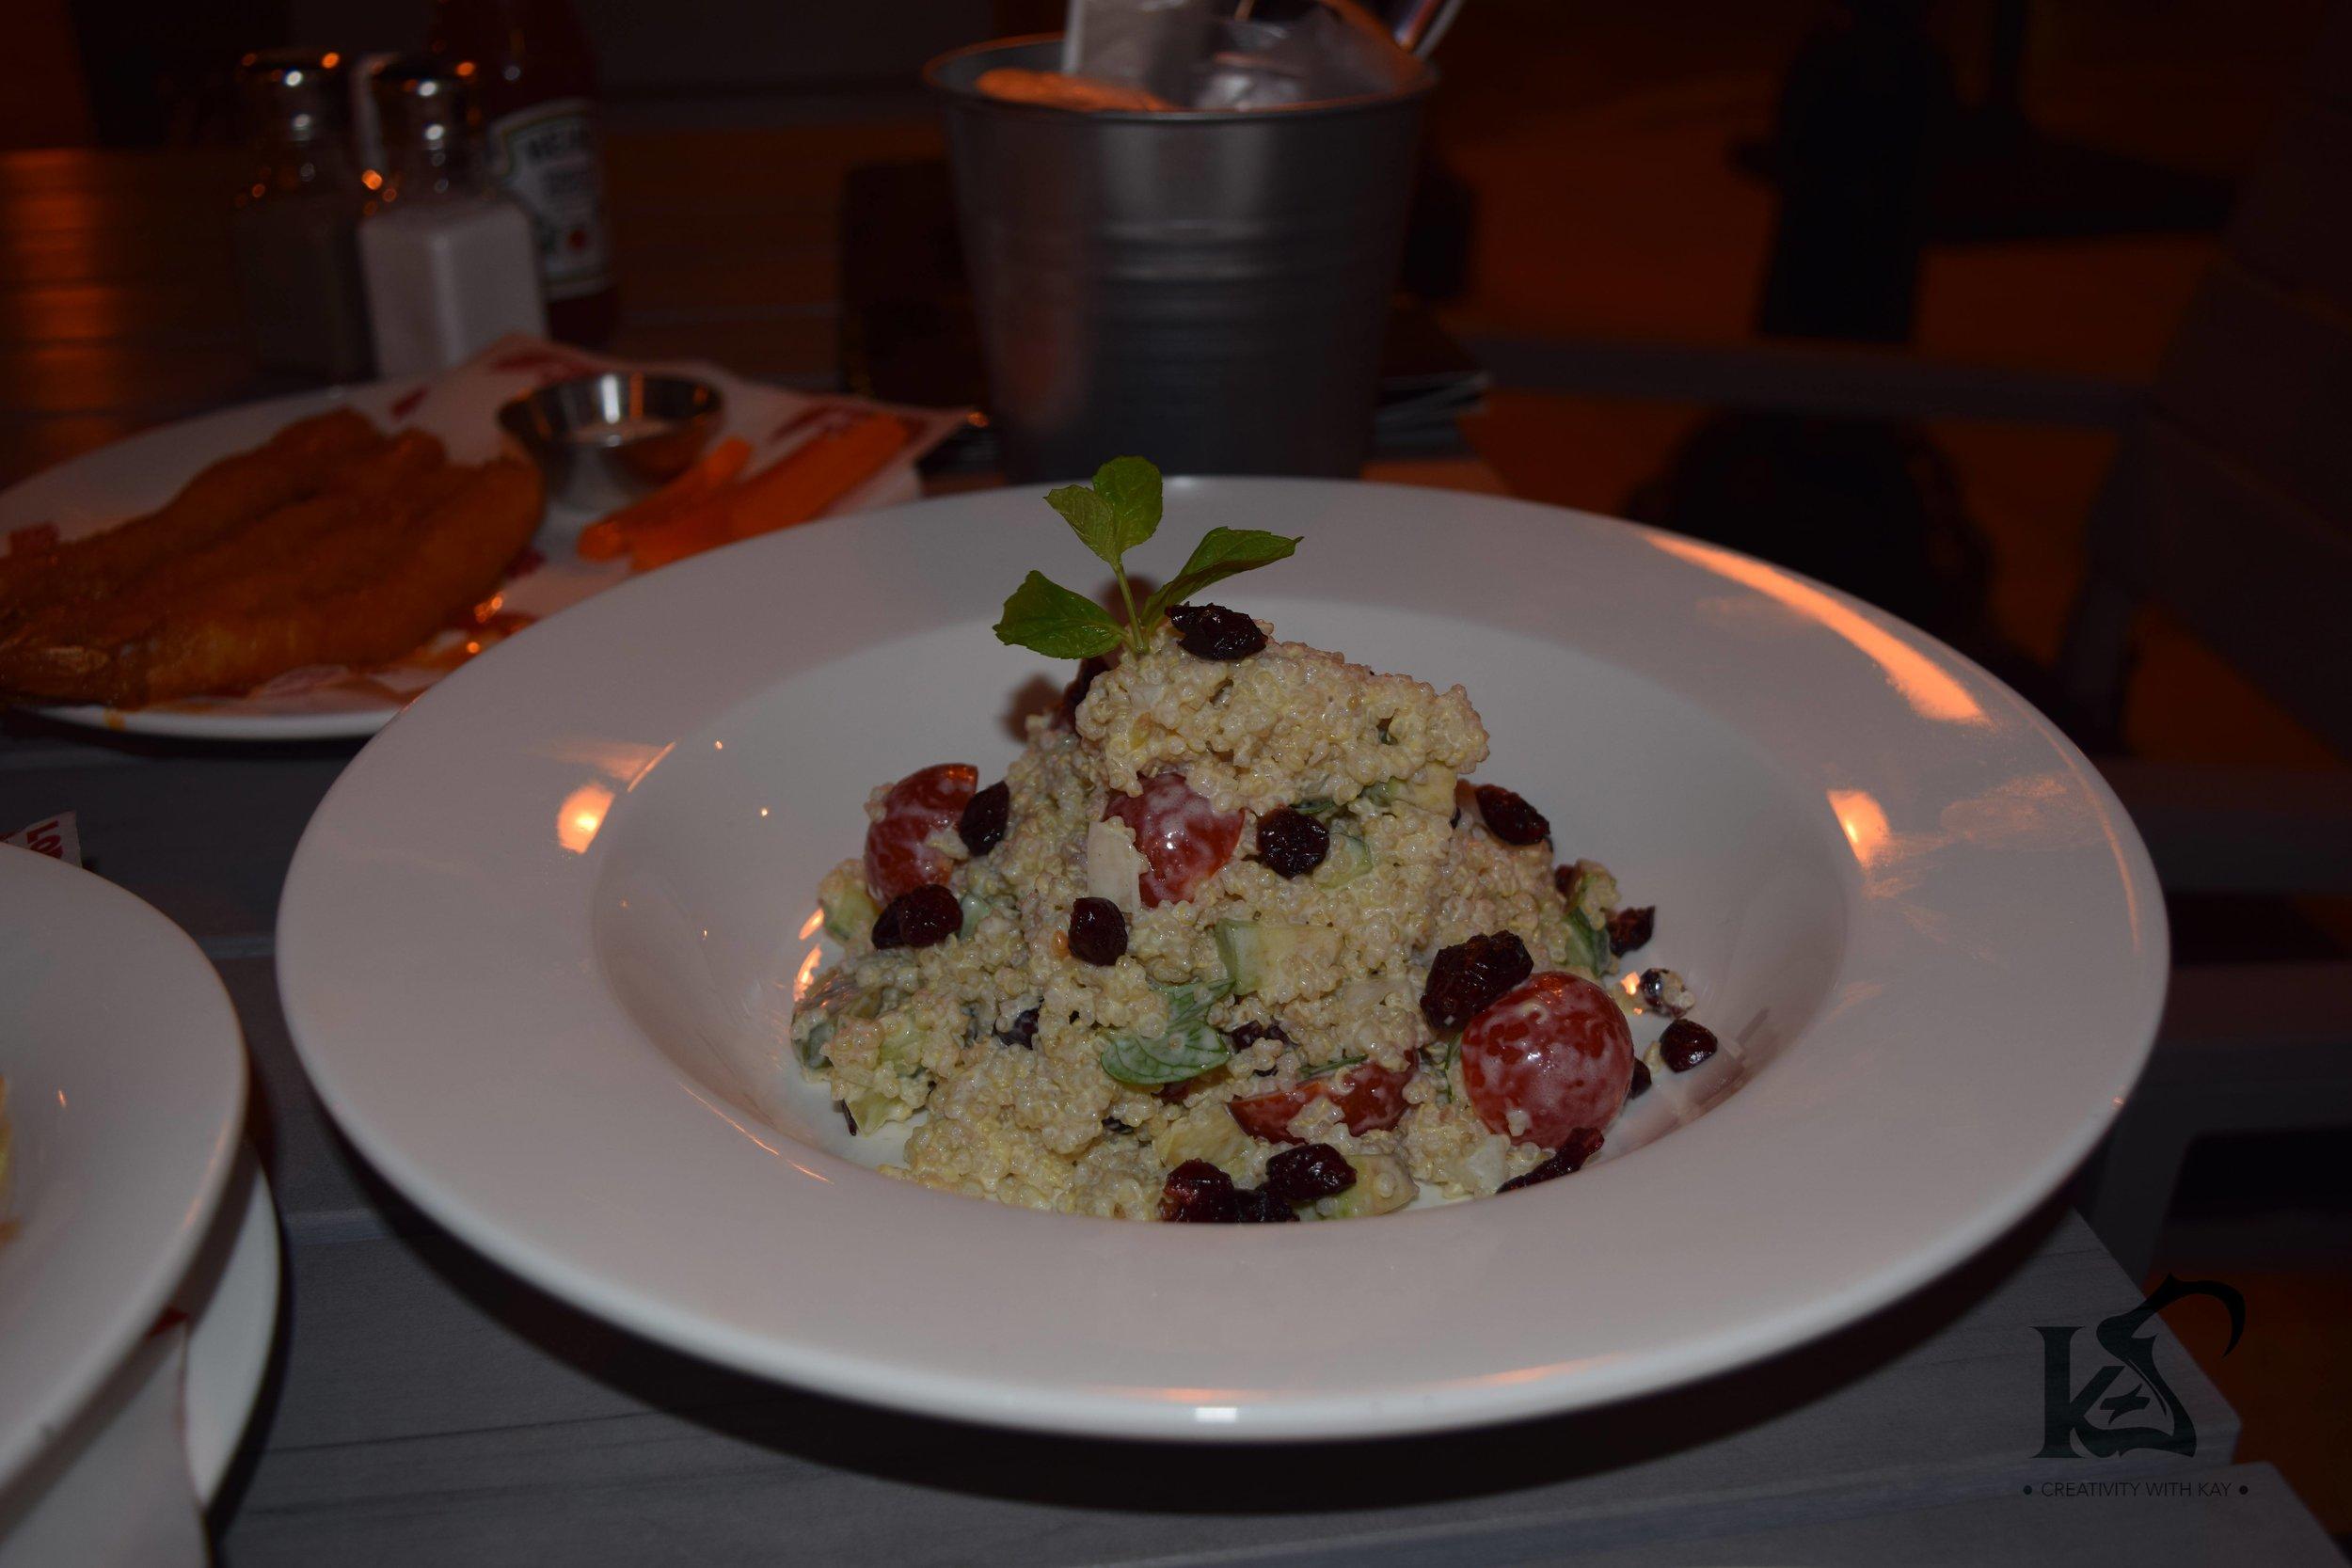 qatar-blogger-khansa-lord-of-the-wings-quinoa-salad